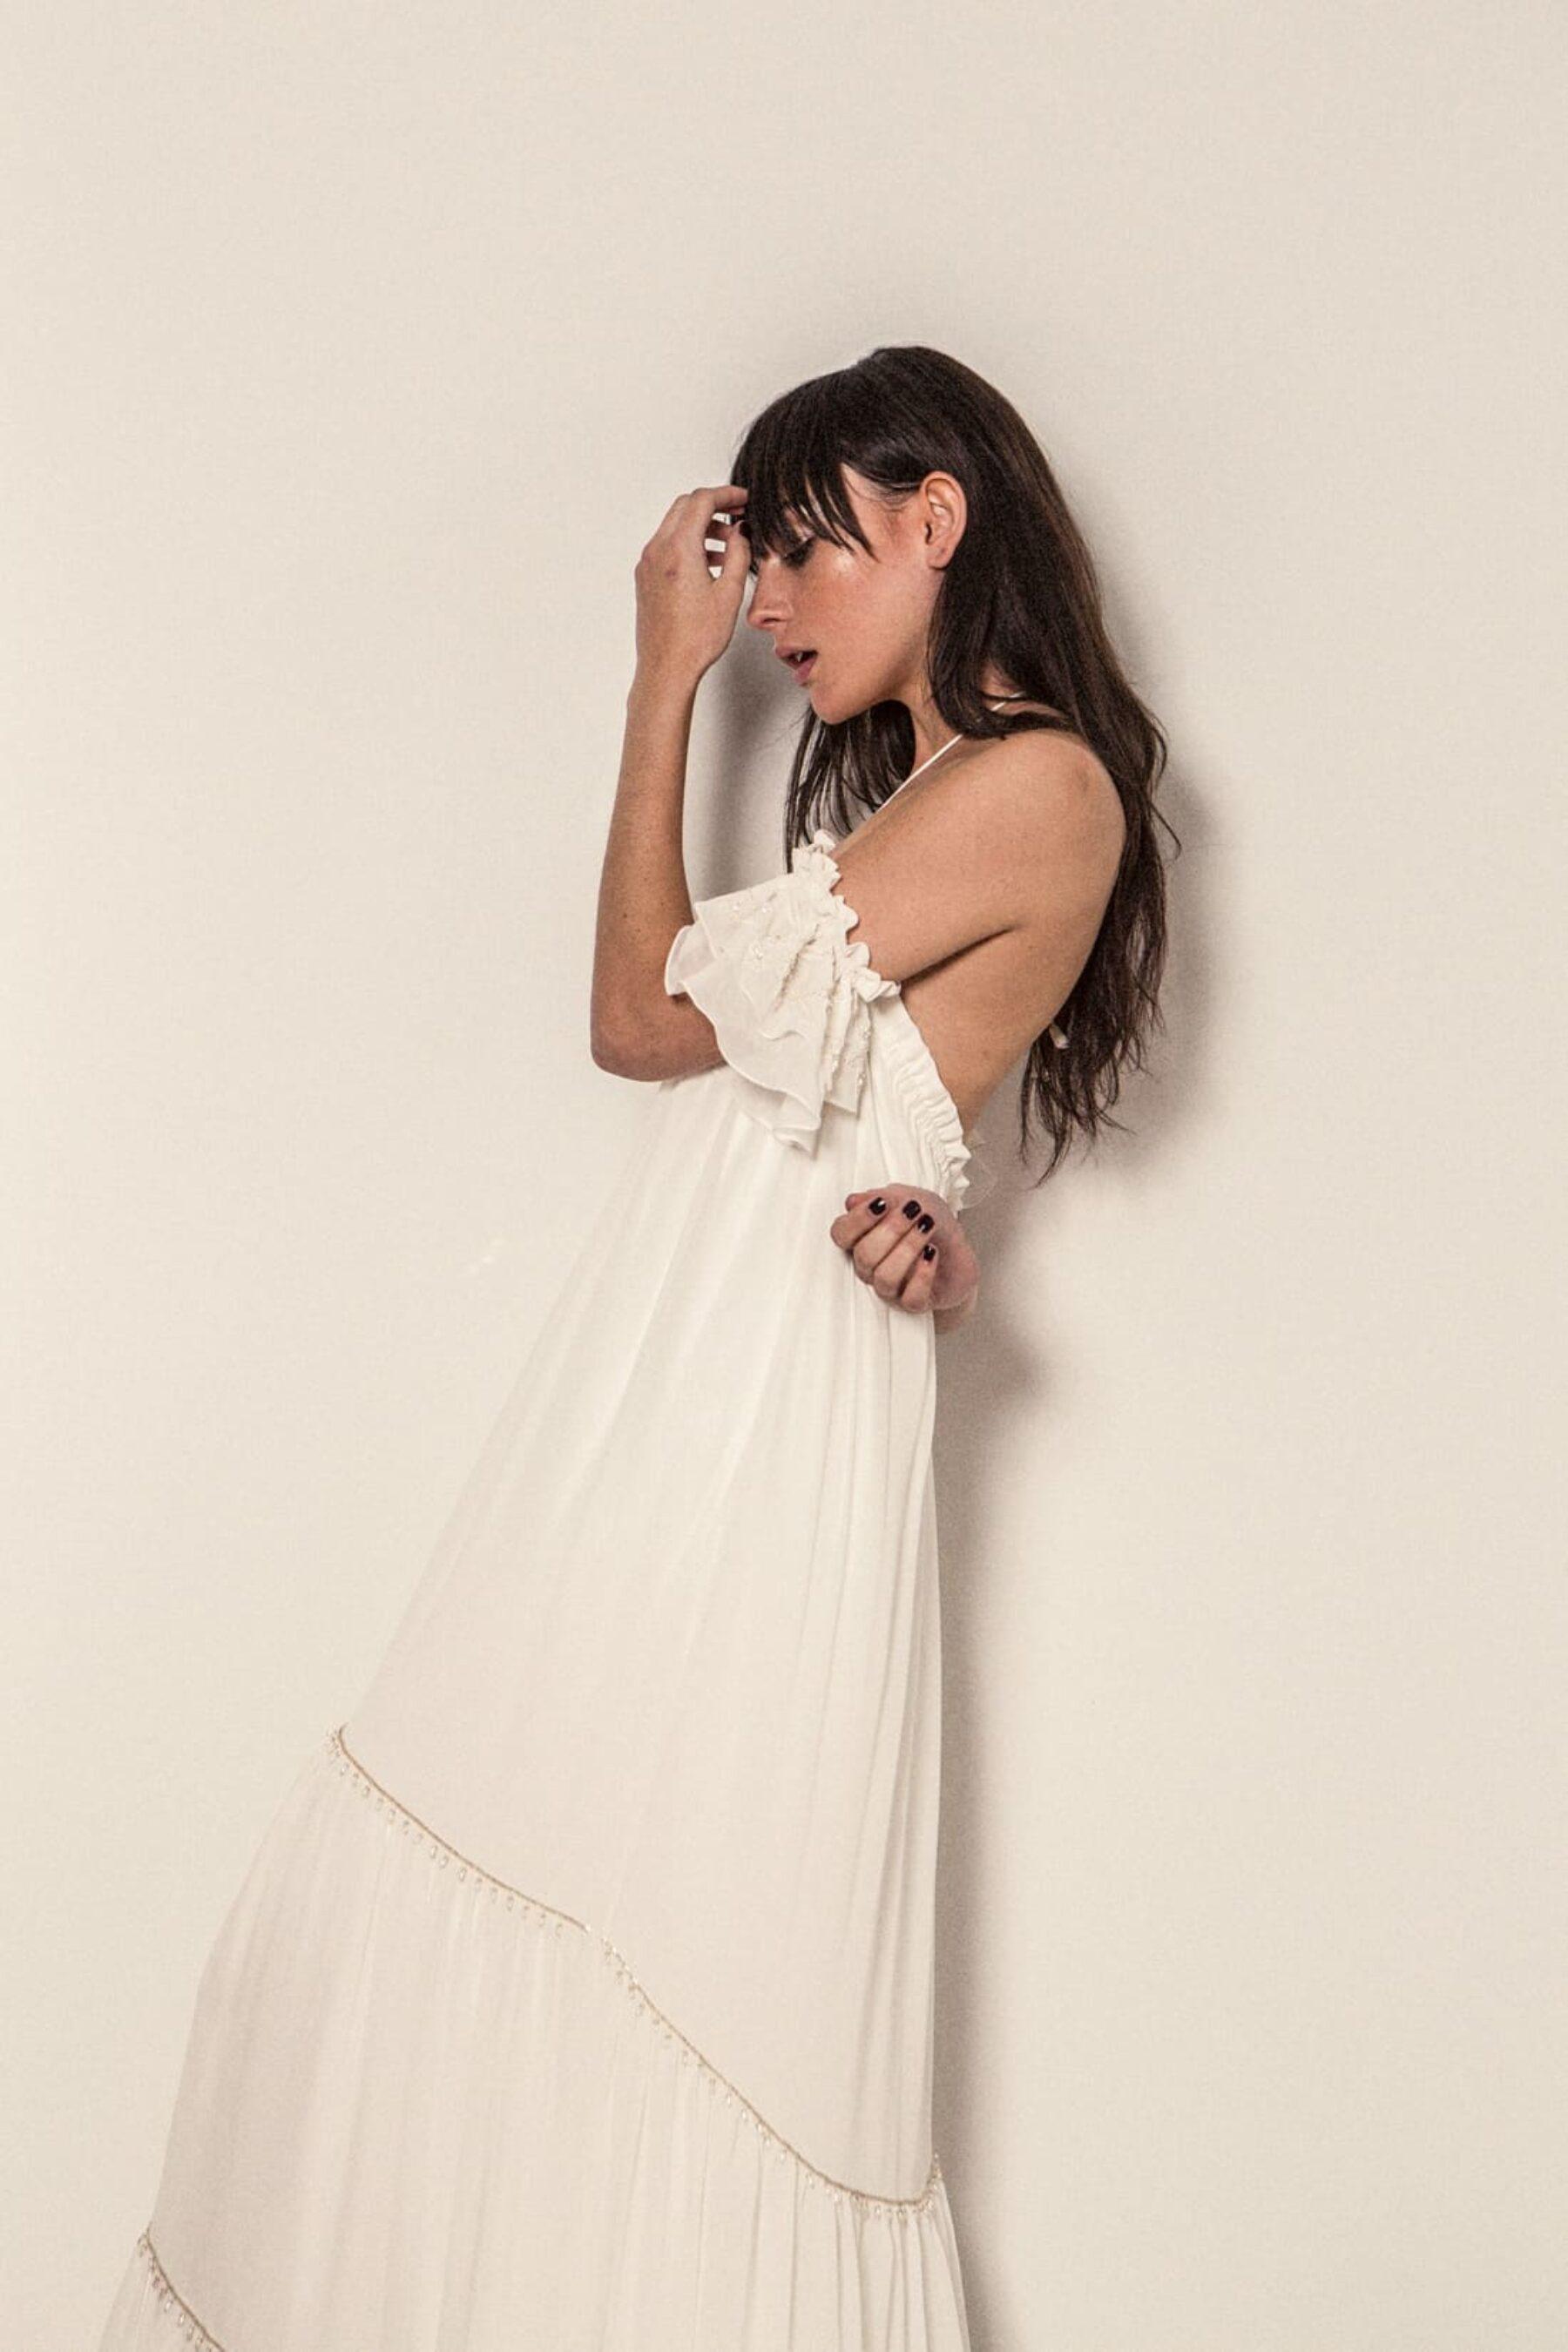 off-shoulder wedding dress by Bo & Luca